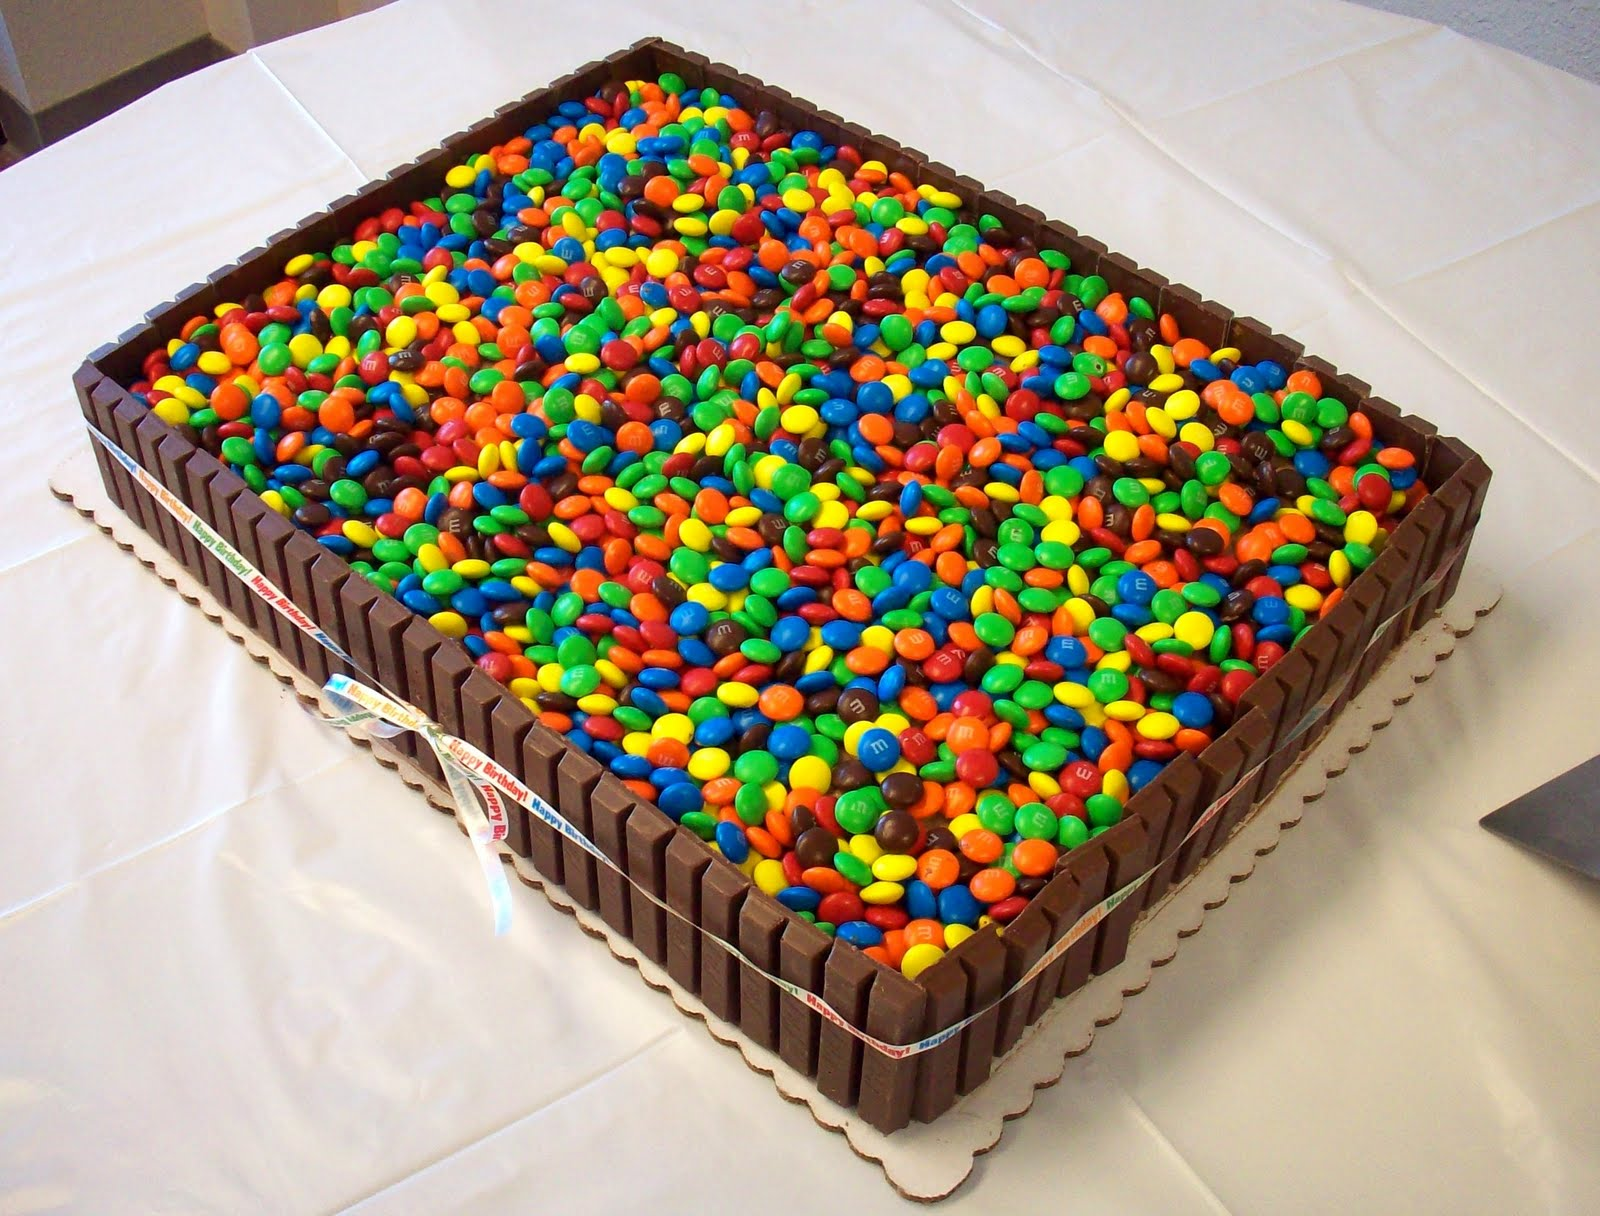 1/2 sheet cake feeds how many